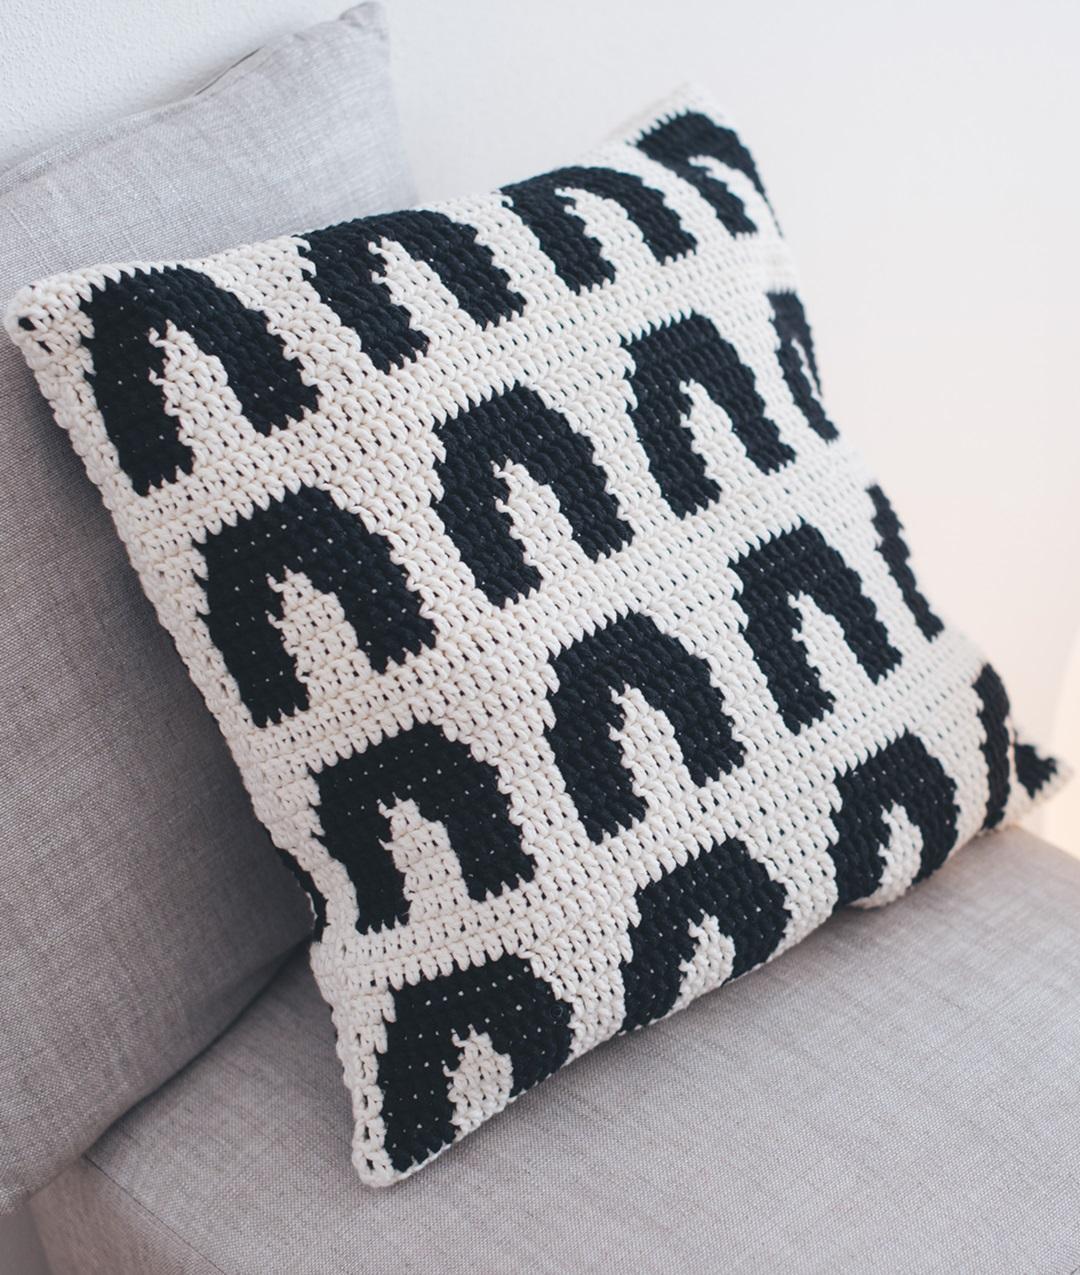 Homeware - Cotton -  - KAARI PILLOW - 1